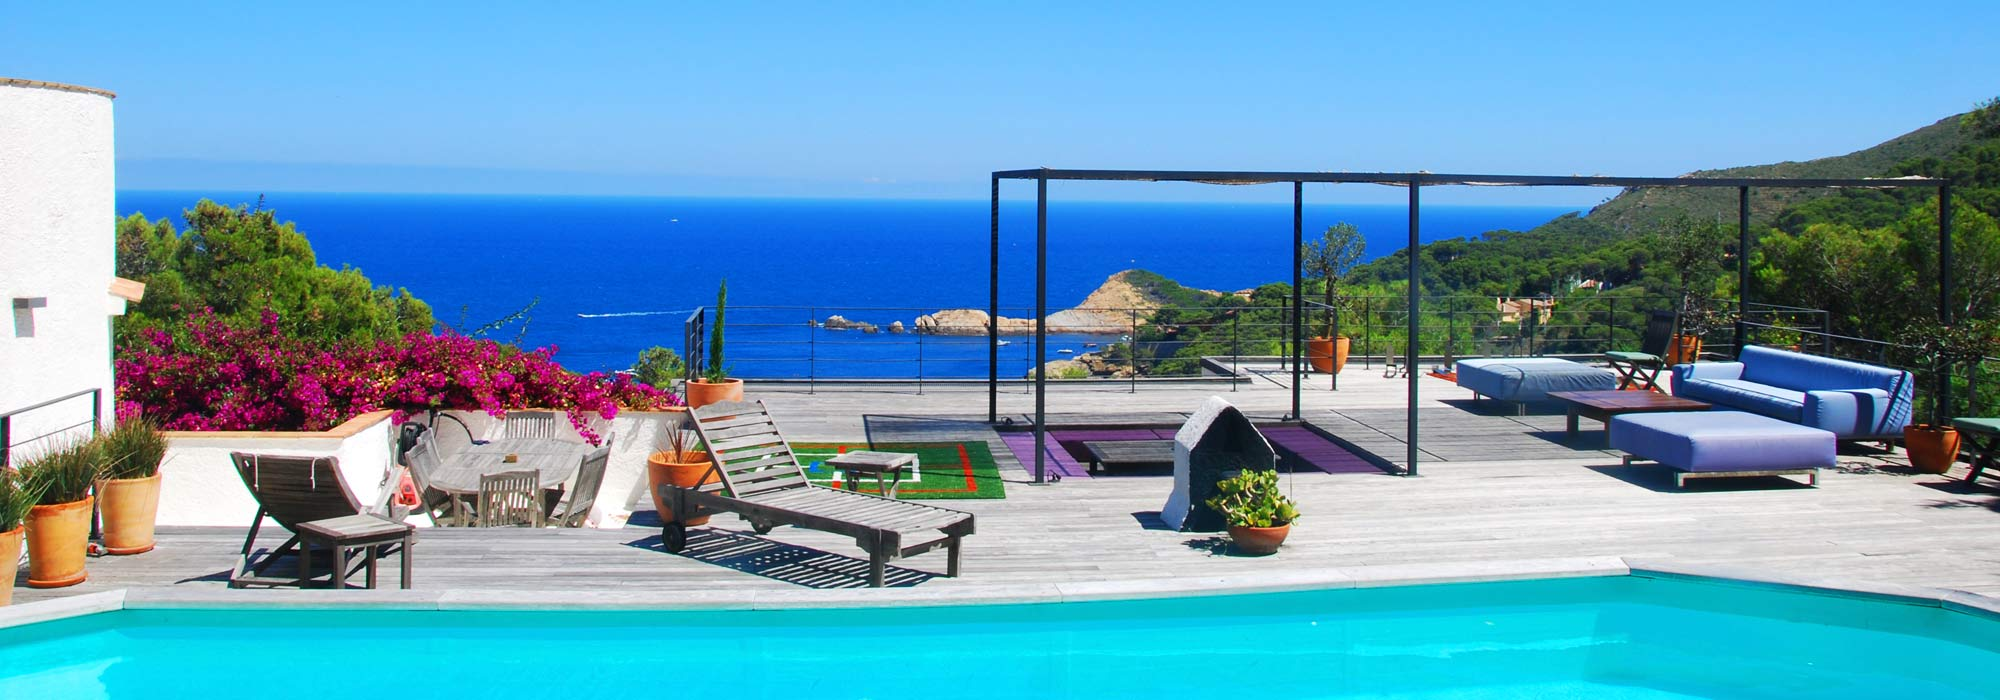 piscina_colores